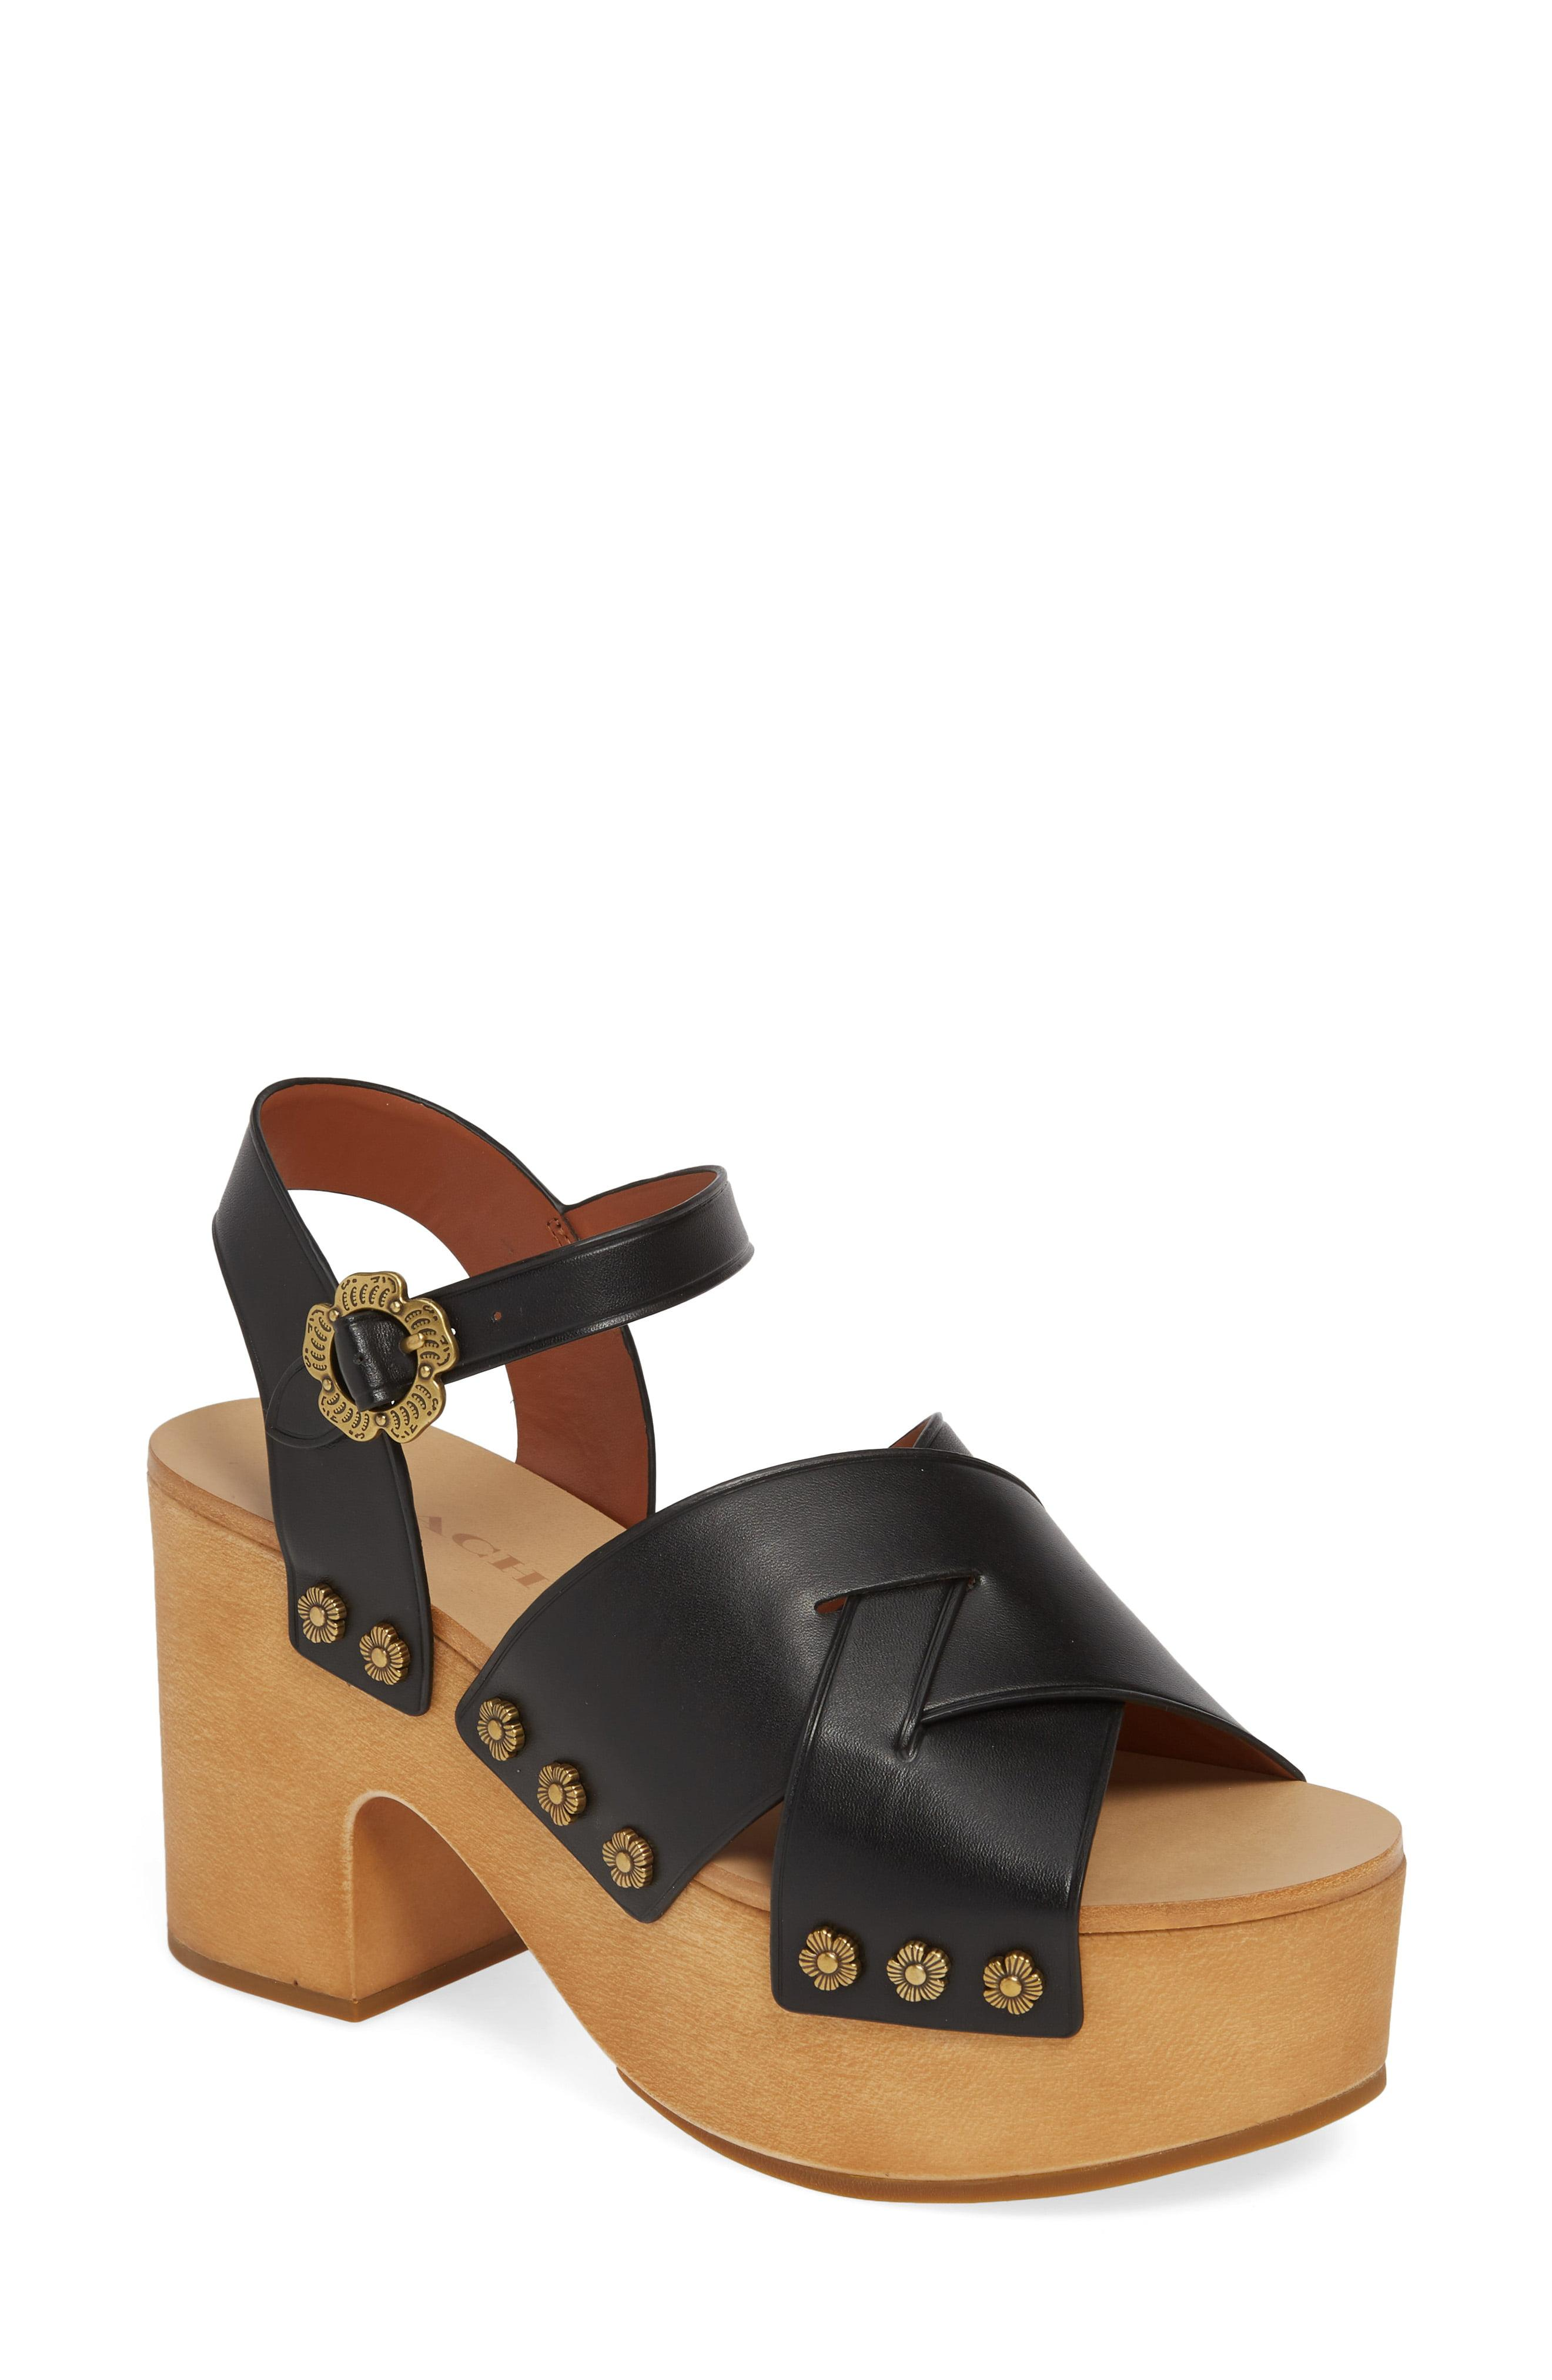 f2ee8a4da Lyst - COACH Nessa Clog Platform Sandal in Black